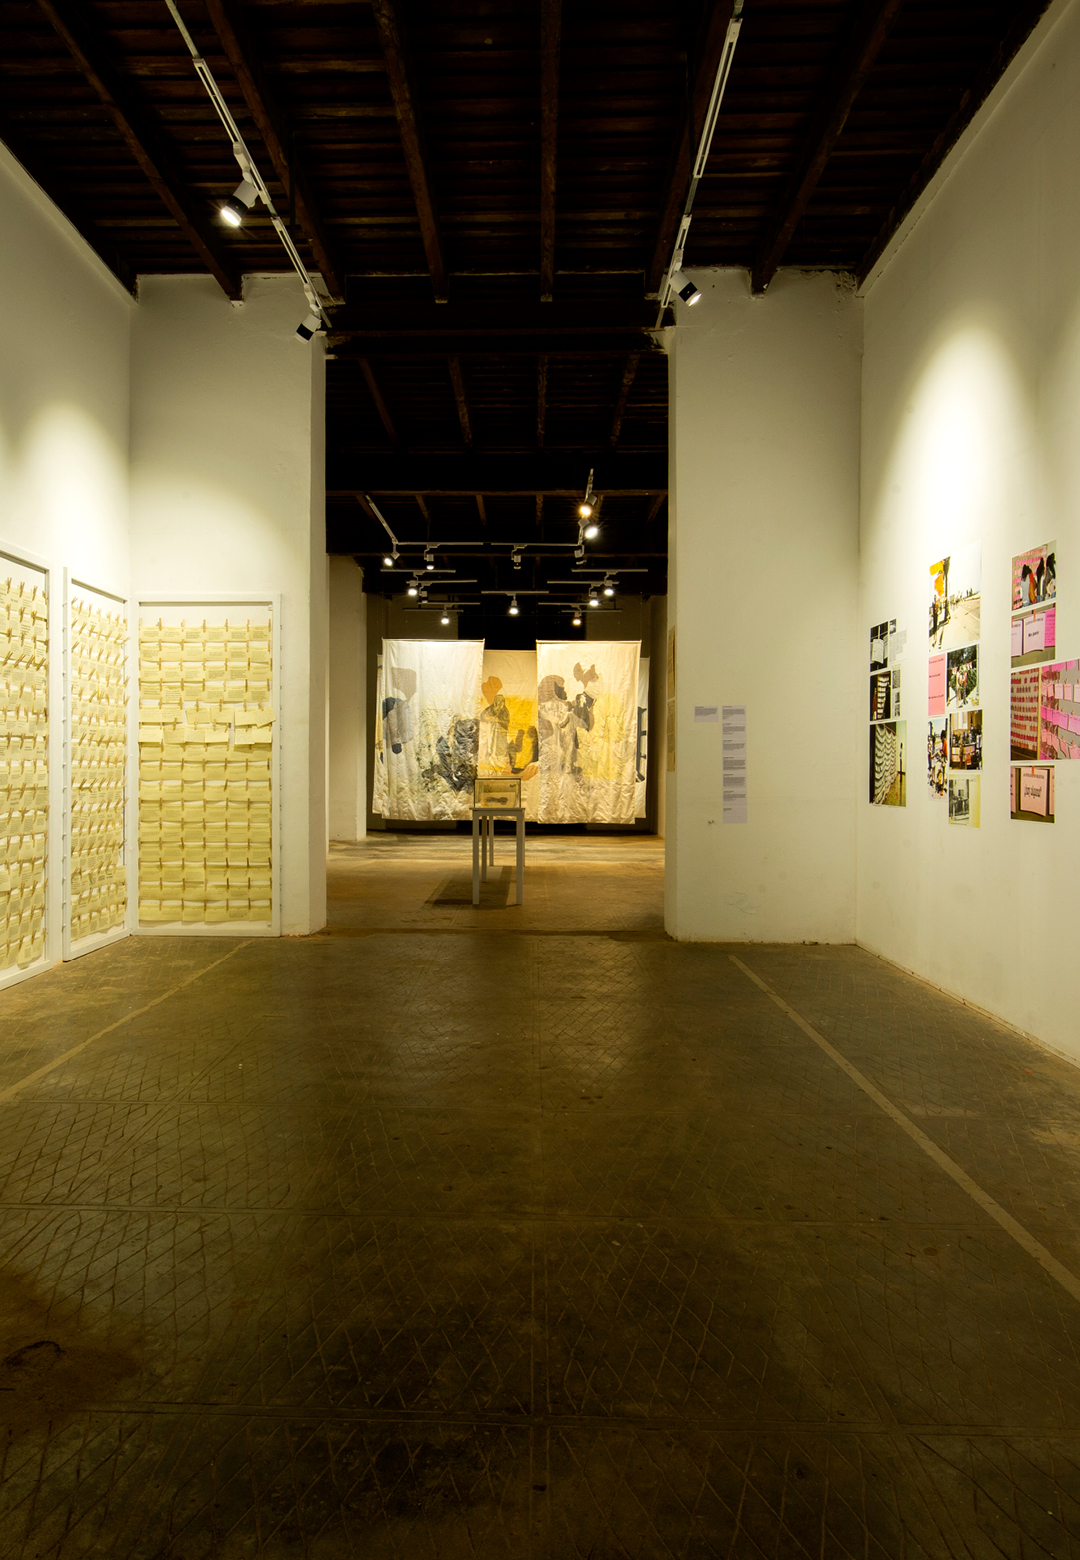 The Clothesline, Monica Mayer, participative installation, 2018, display 1| Kochi Muziris Biennale| STIR